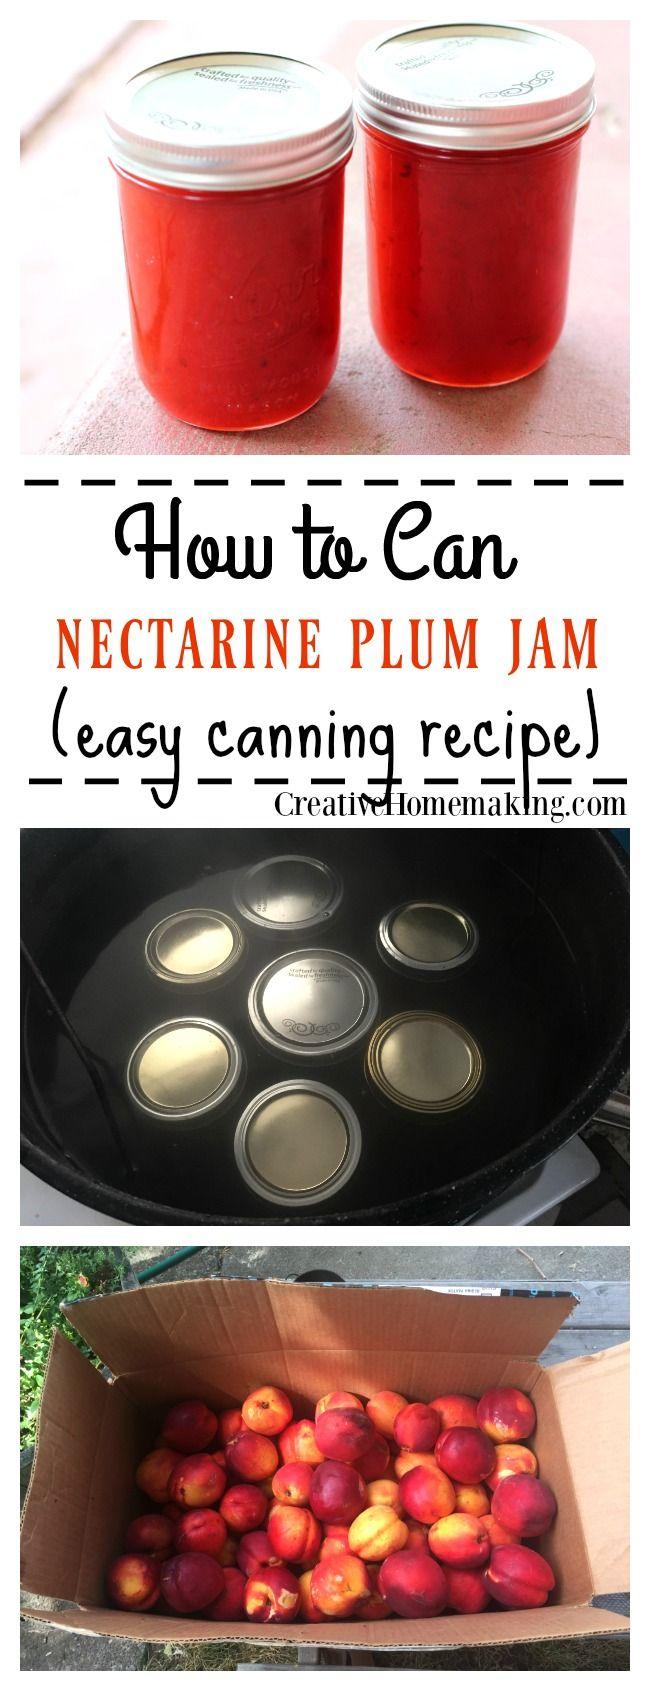 Easy recipe for canning homemade nectarine plum jam. Learn how to make jam like a pro!